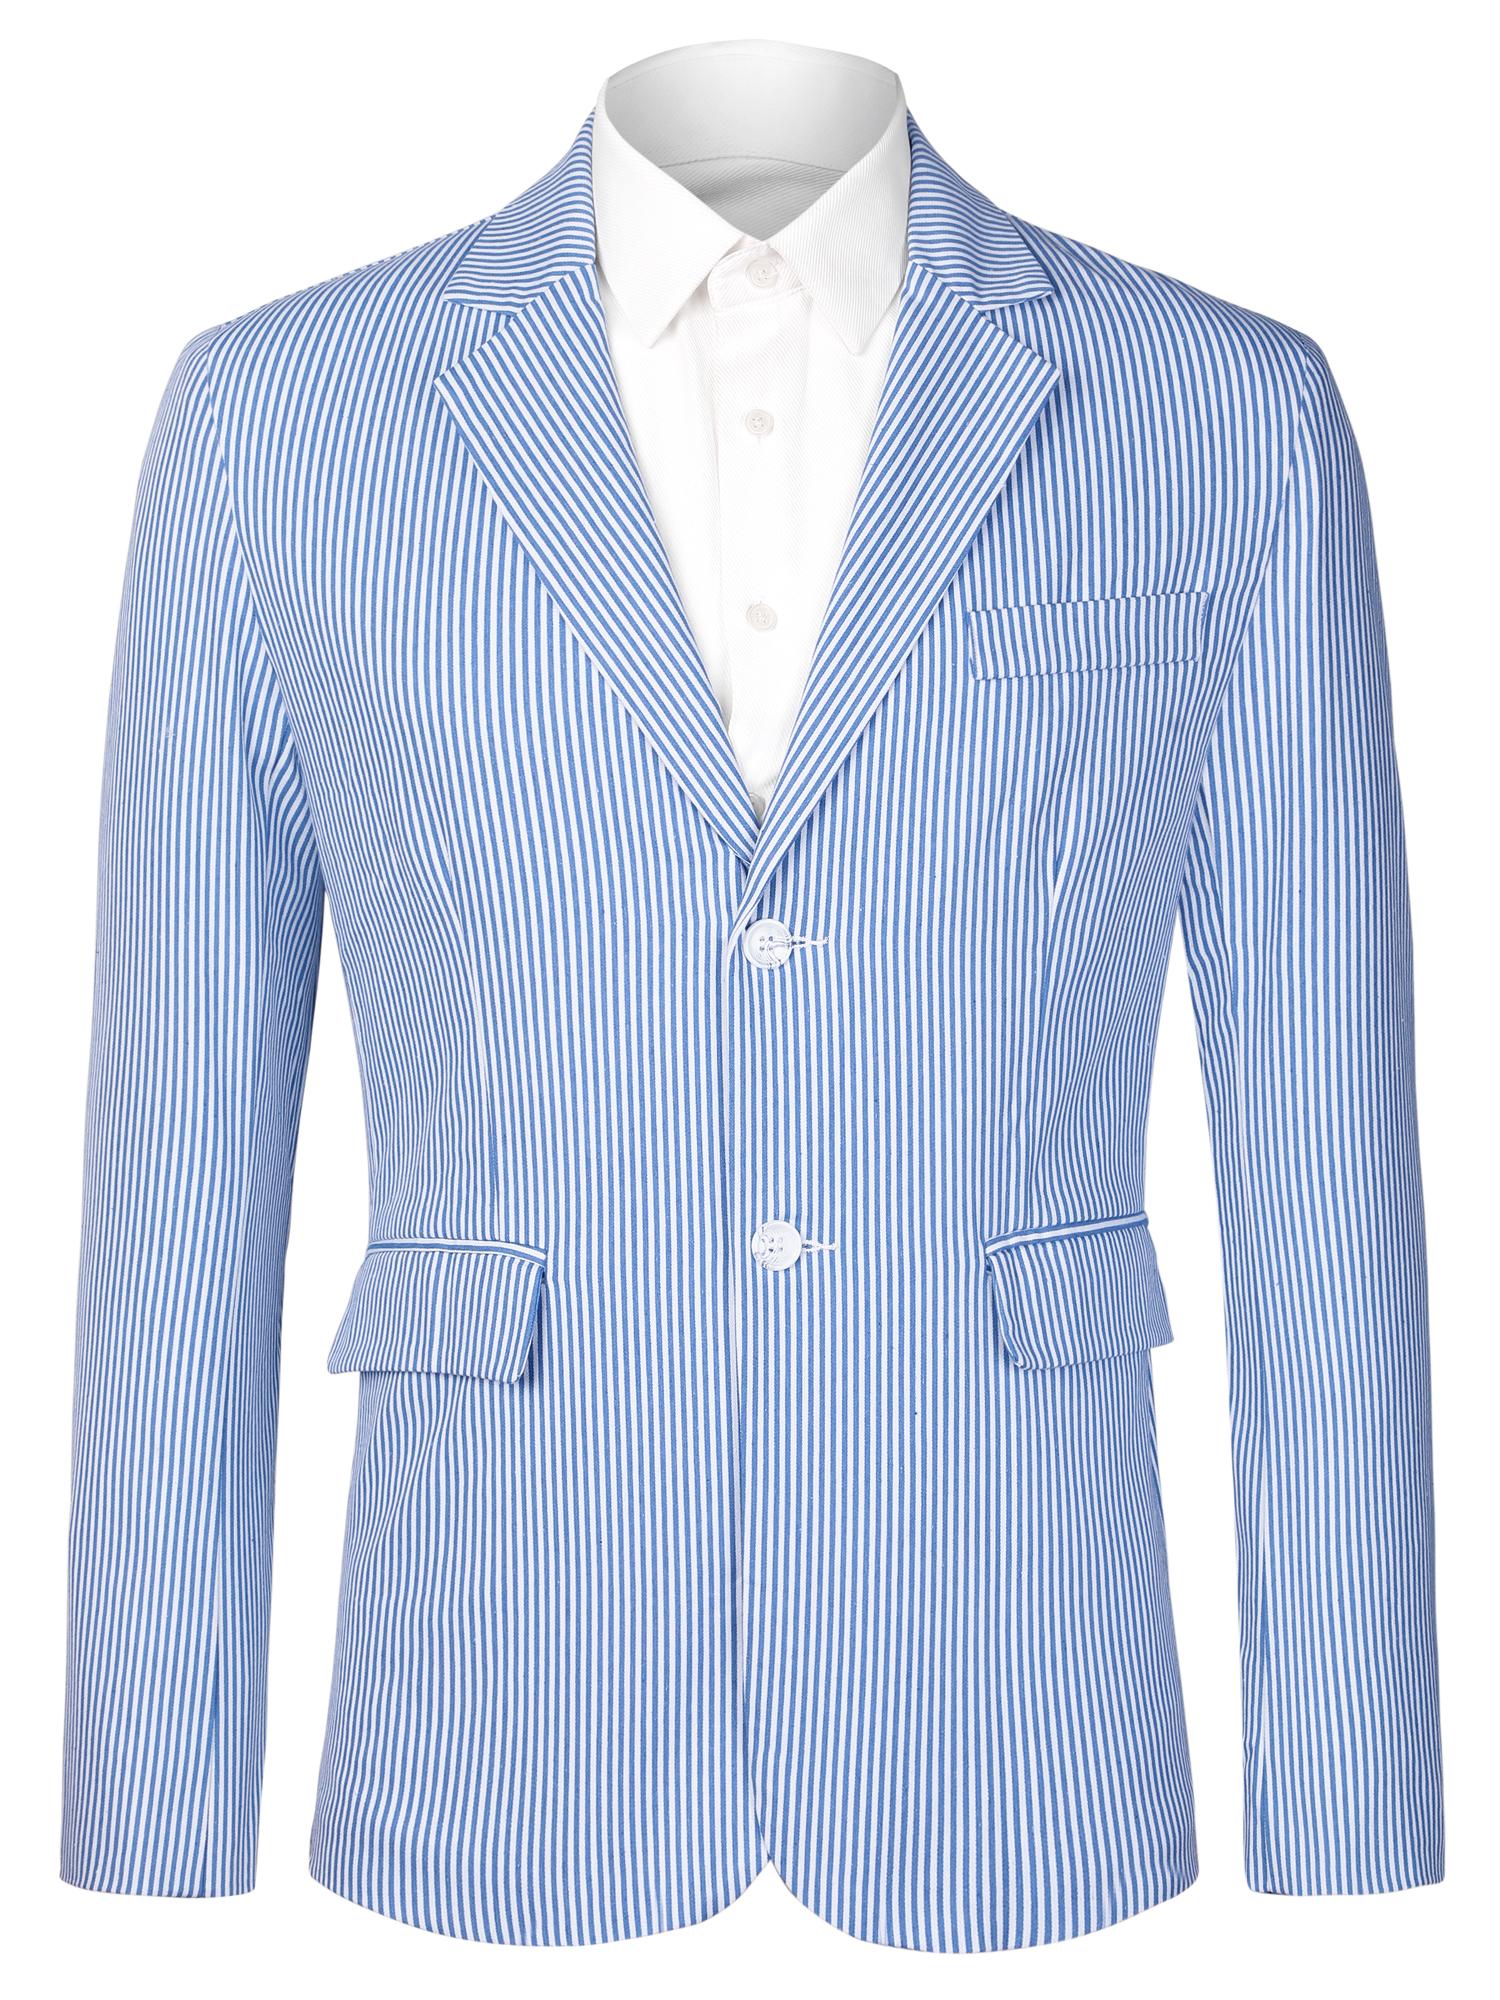 Men Vertical Stripes Notched Lapel Long Sleeves Two-Button Blazer Blue White L